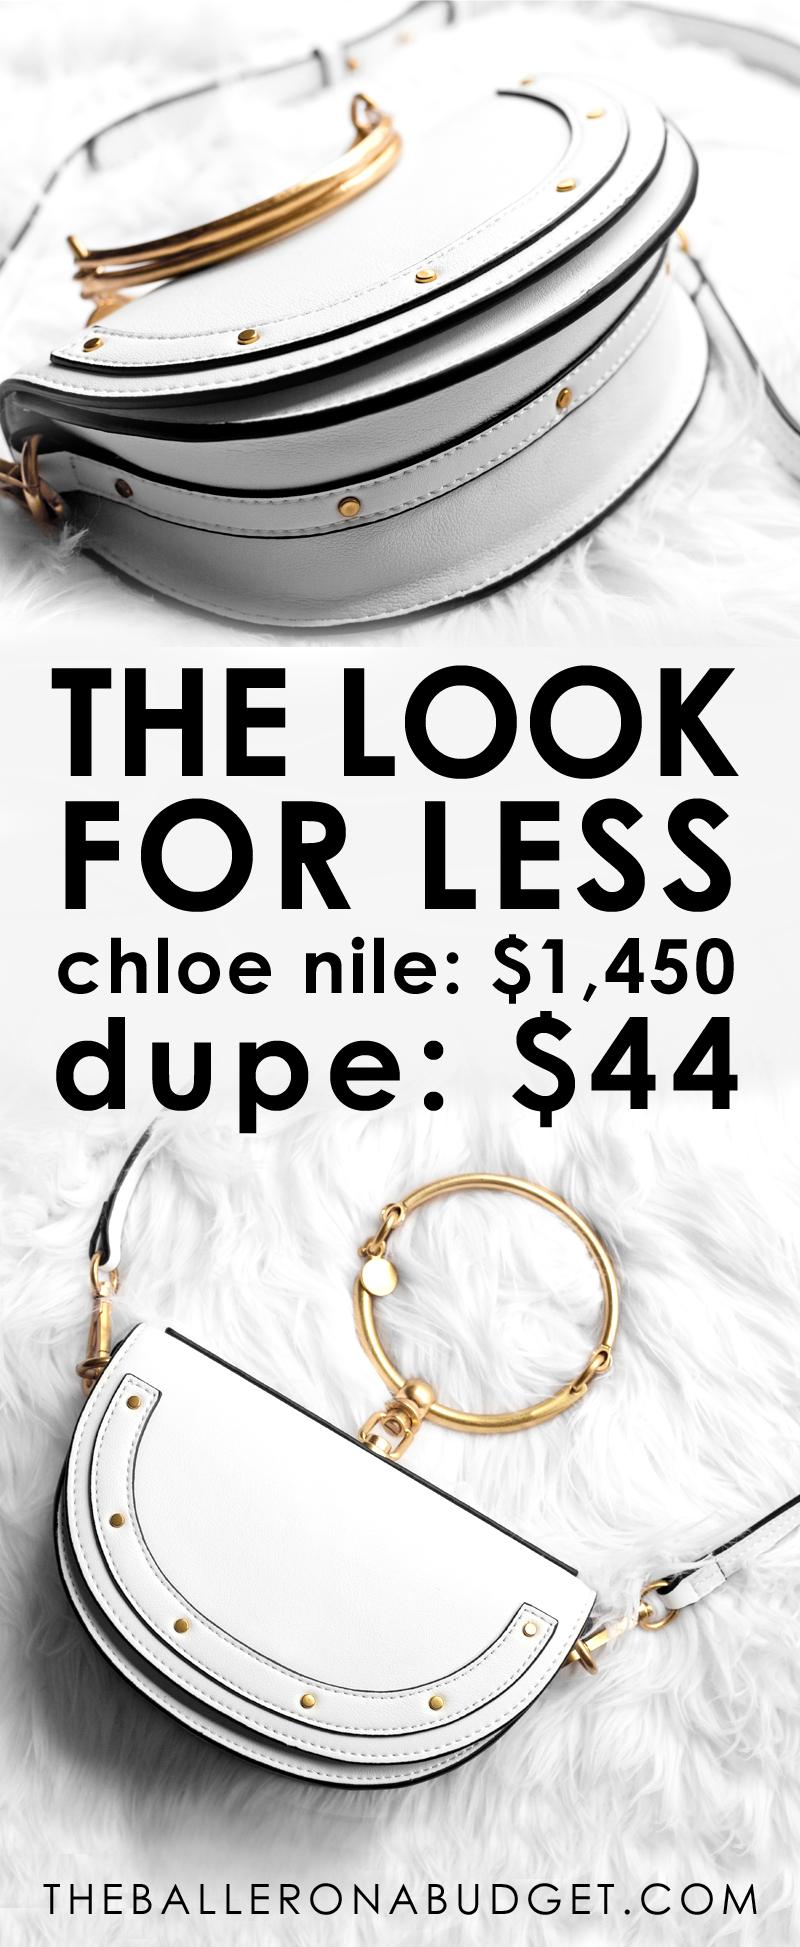 85709127be6 Designer Dupe: Balenciaga Ceinture Ankle Boot - $1,275 vs. $100 ...